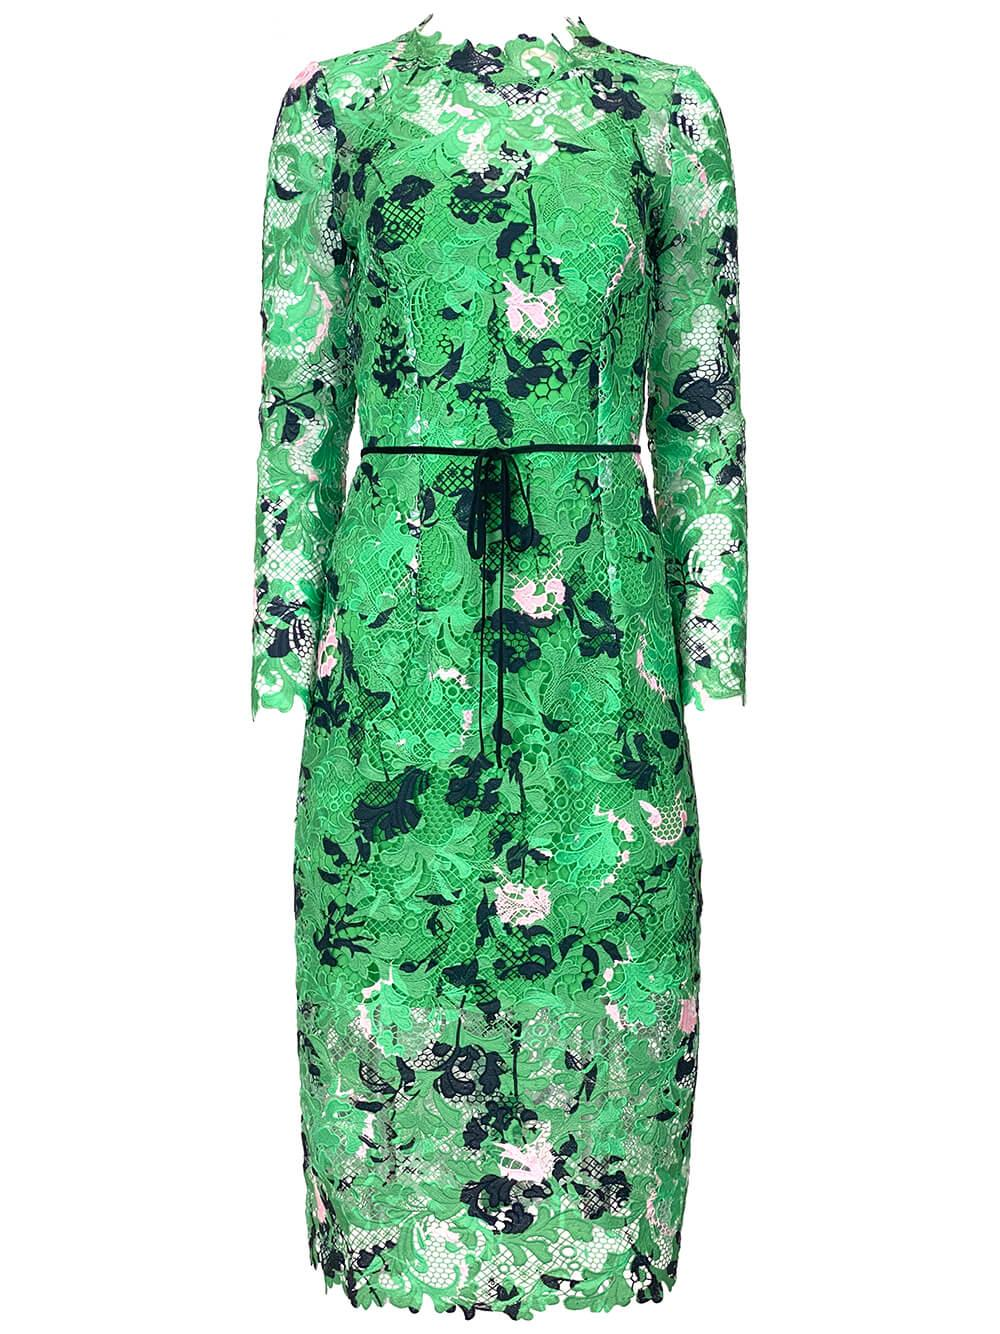 Floral Lace Sheath Dress Item # 21450-460